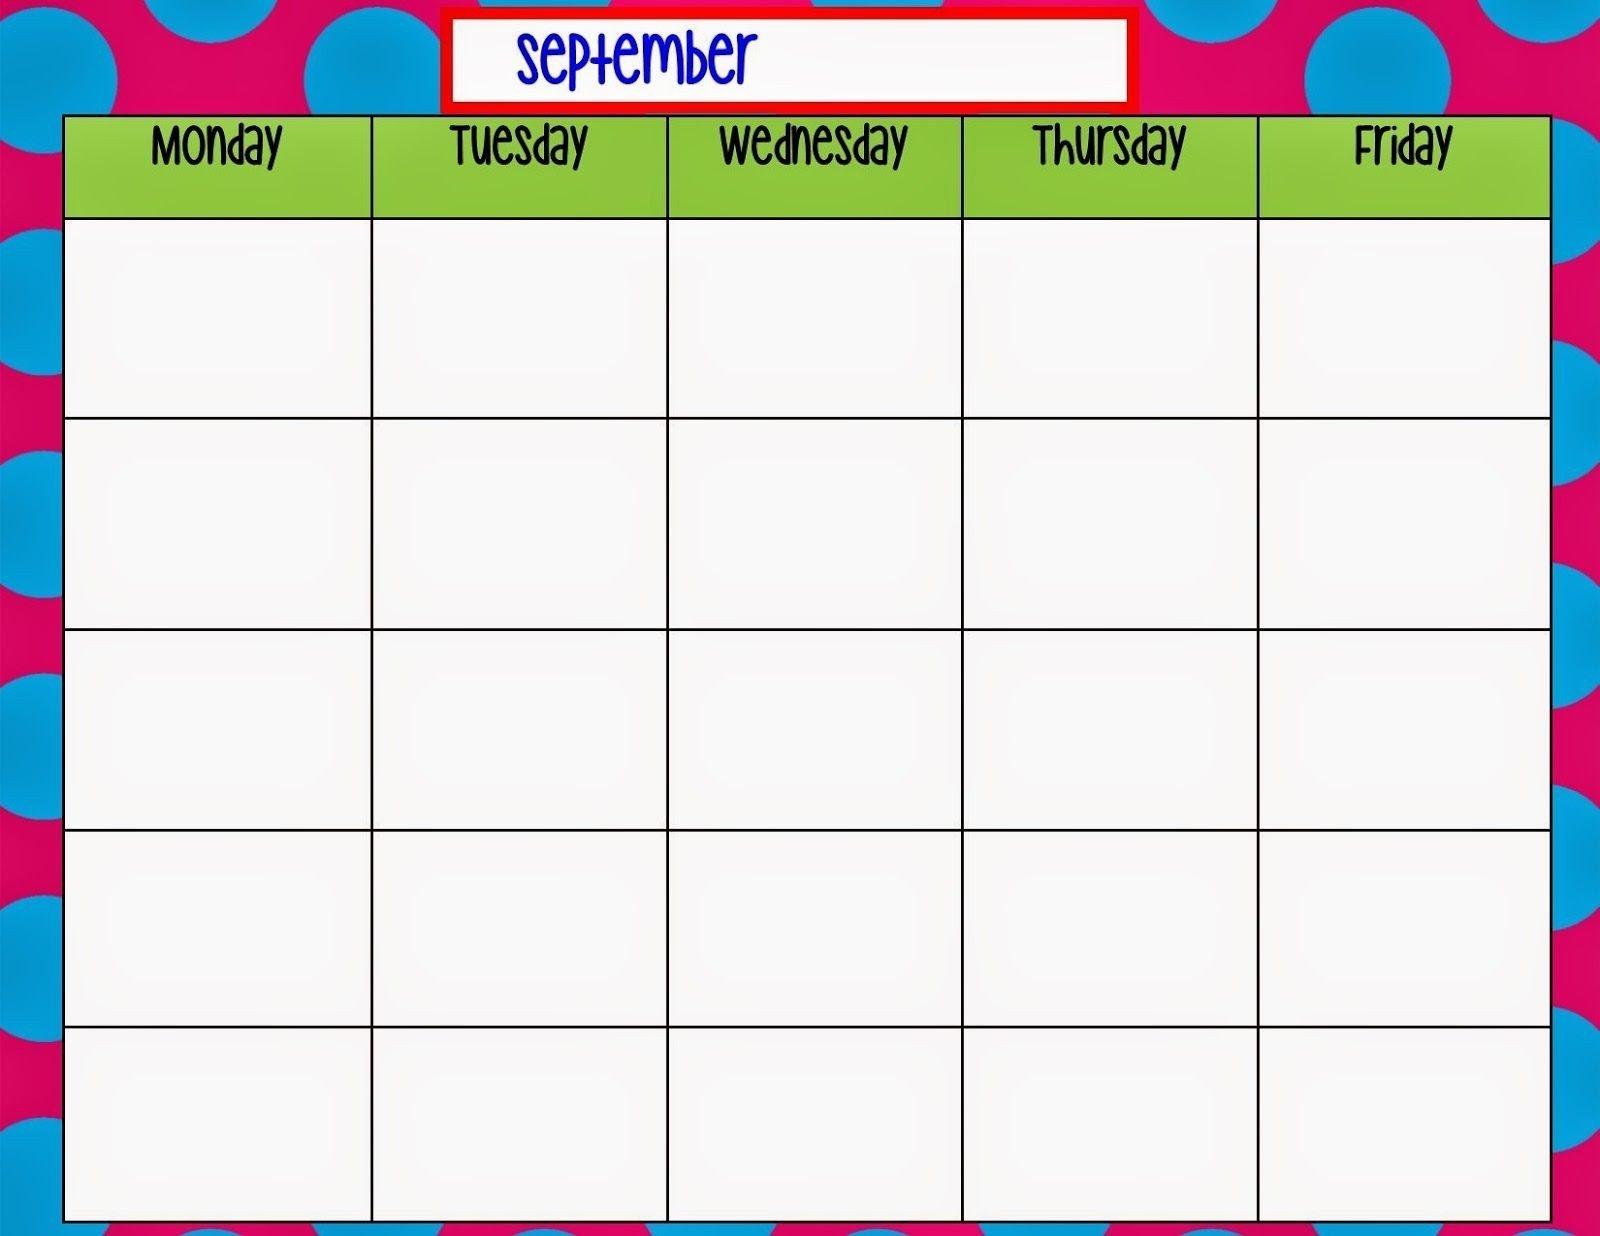 Monthly Calendar Monday To Friday   Calendar Template Monday To Friday Weekly Calendar